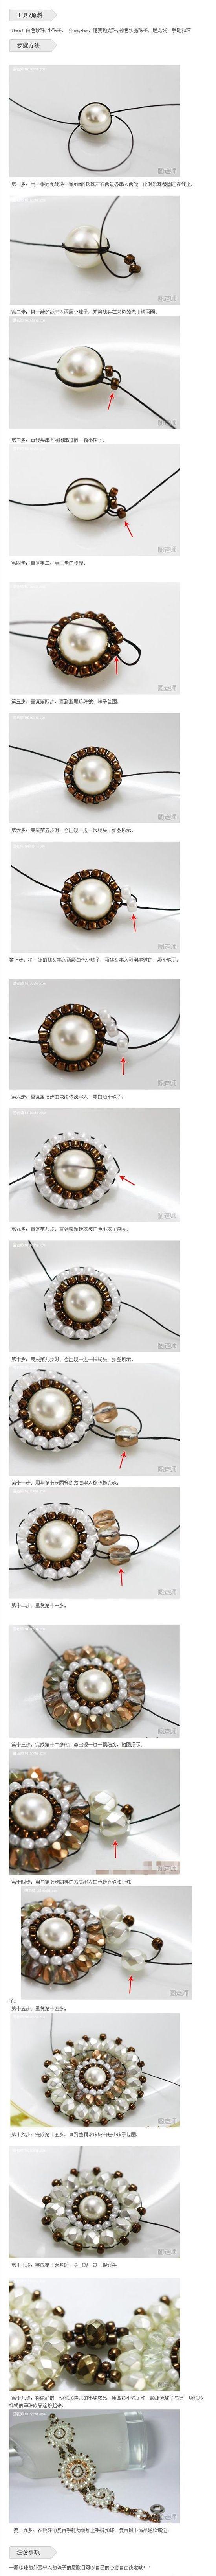 DIY Retro Beaded Bracelet #DIY#Retro#Beaded#Bracelet